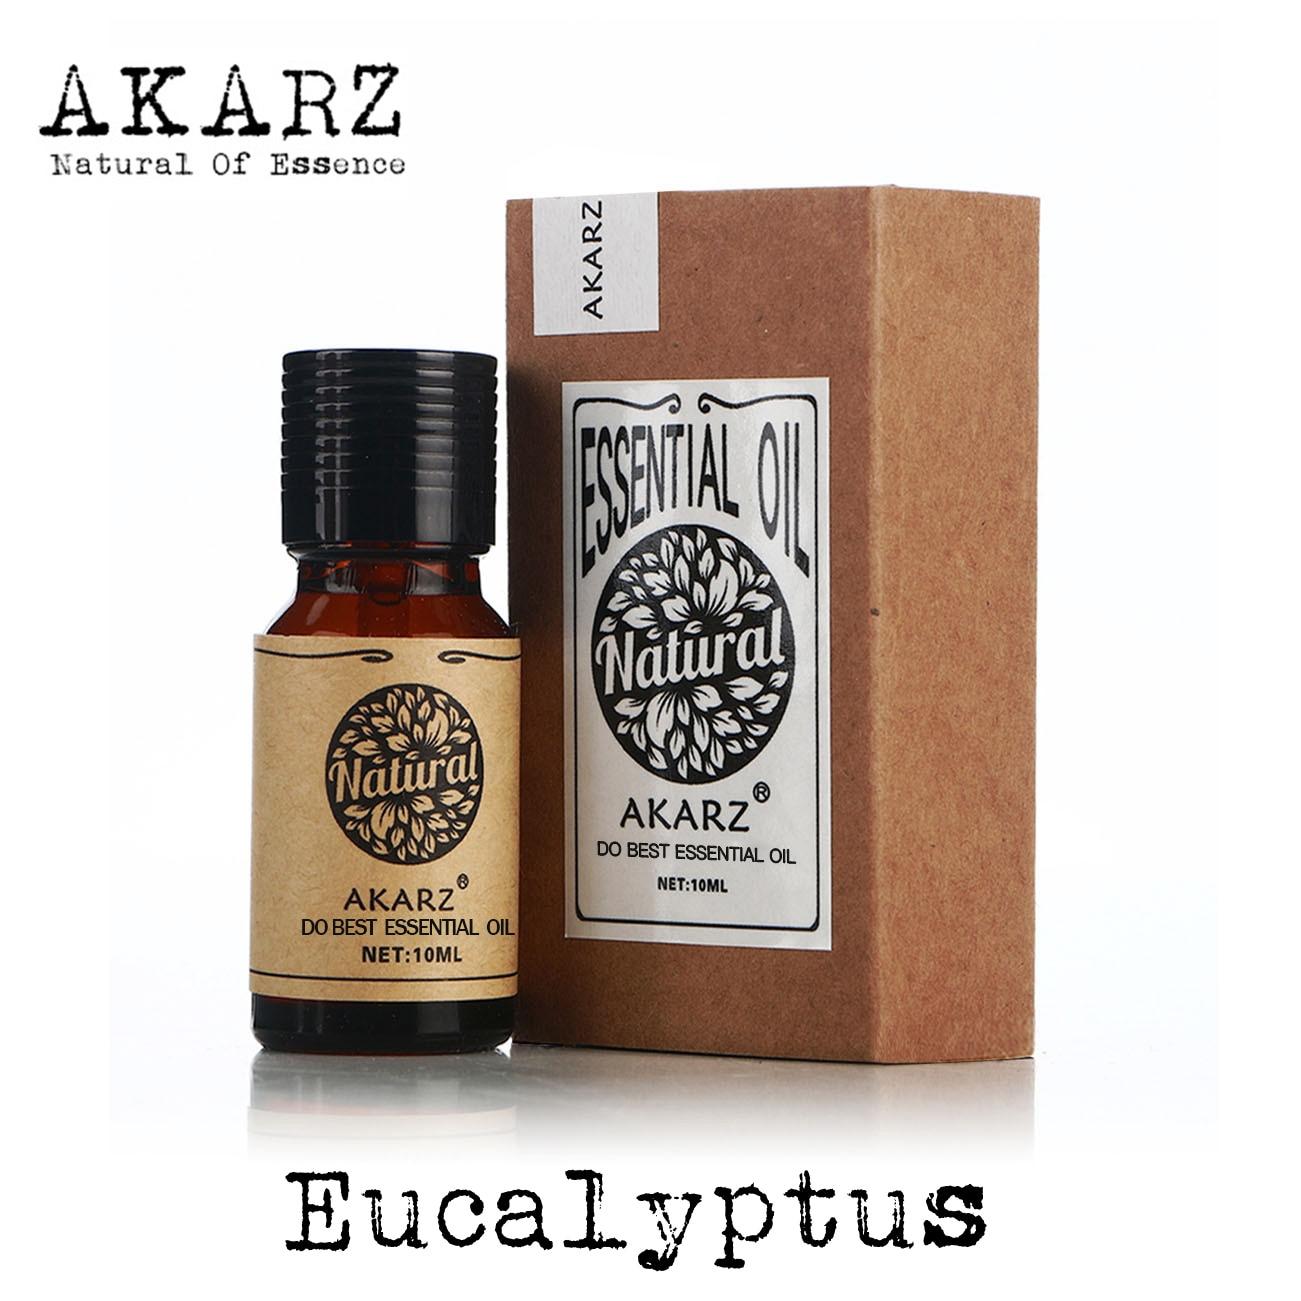 AliExpress - AKARZ Famous brand eucalyptus essential oil Beauty care Relieve nasal congestion headache Eliminate muscle ache eucalyptus oil